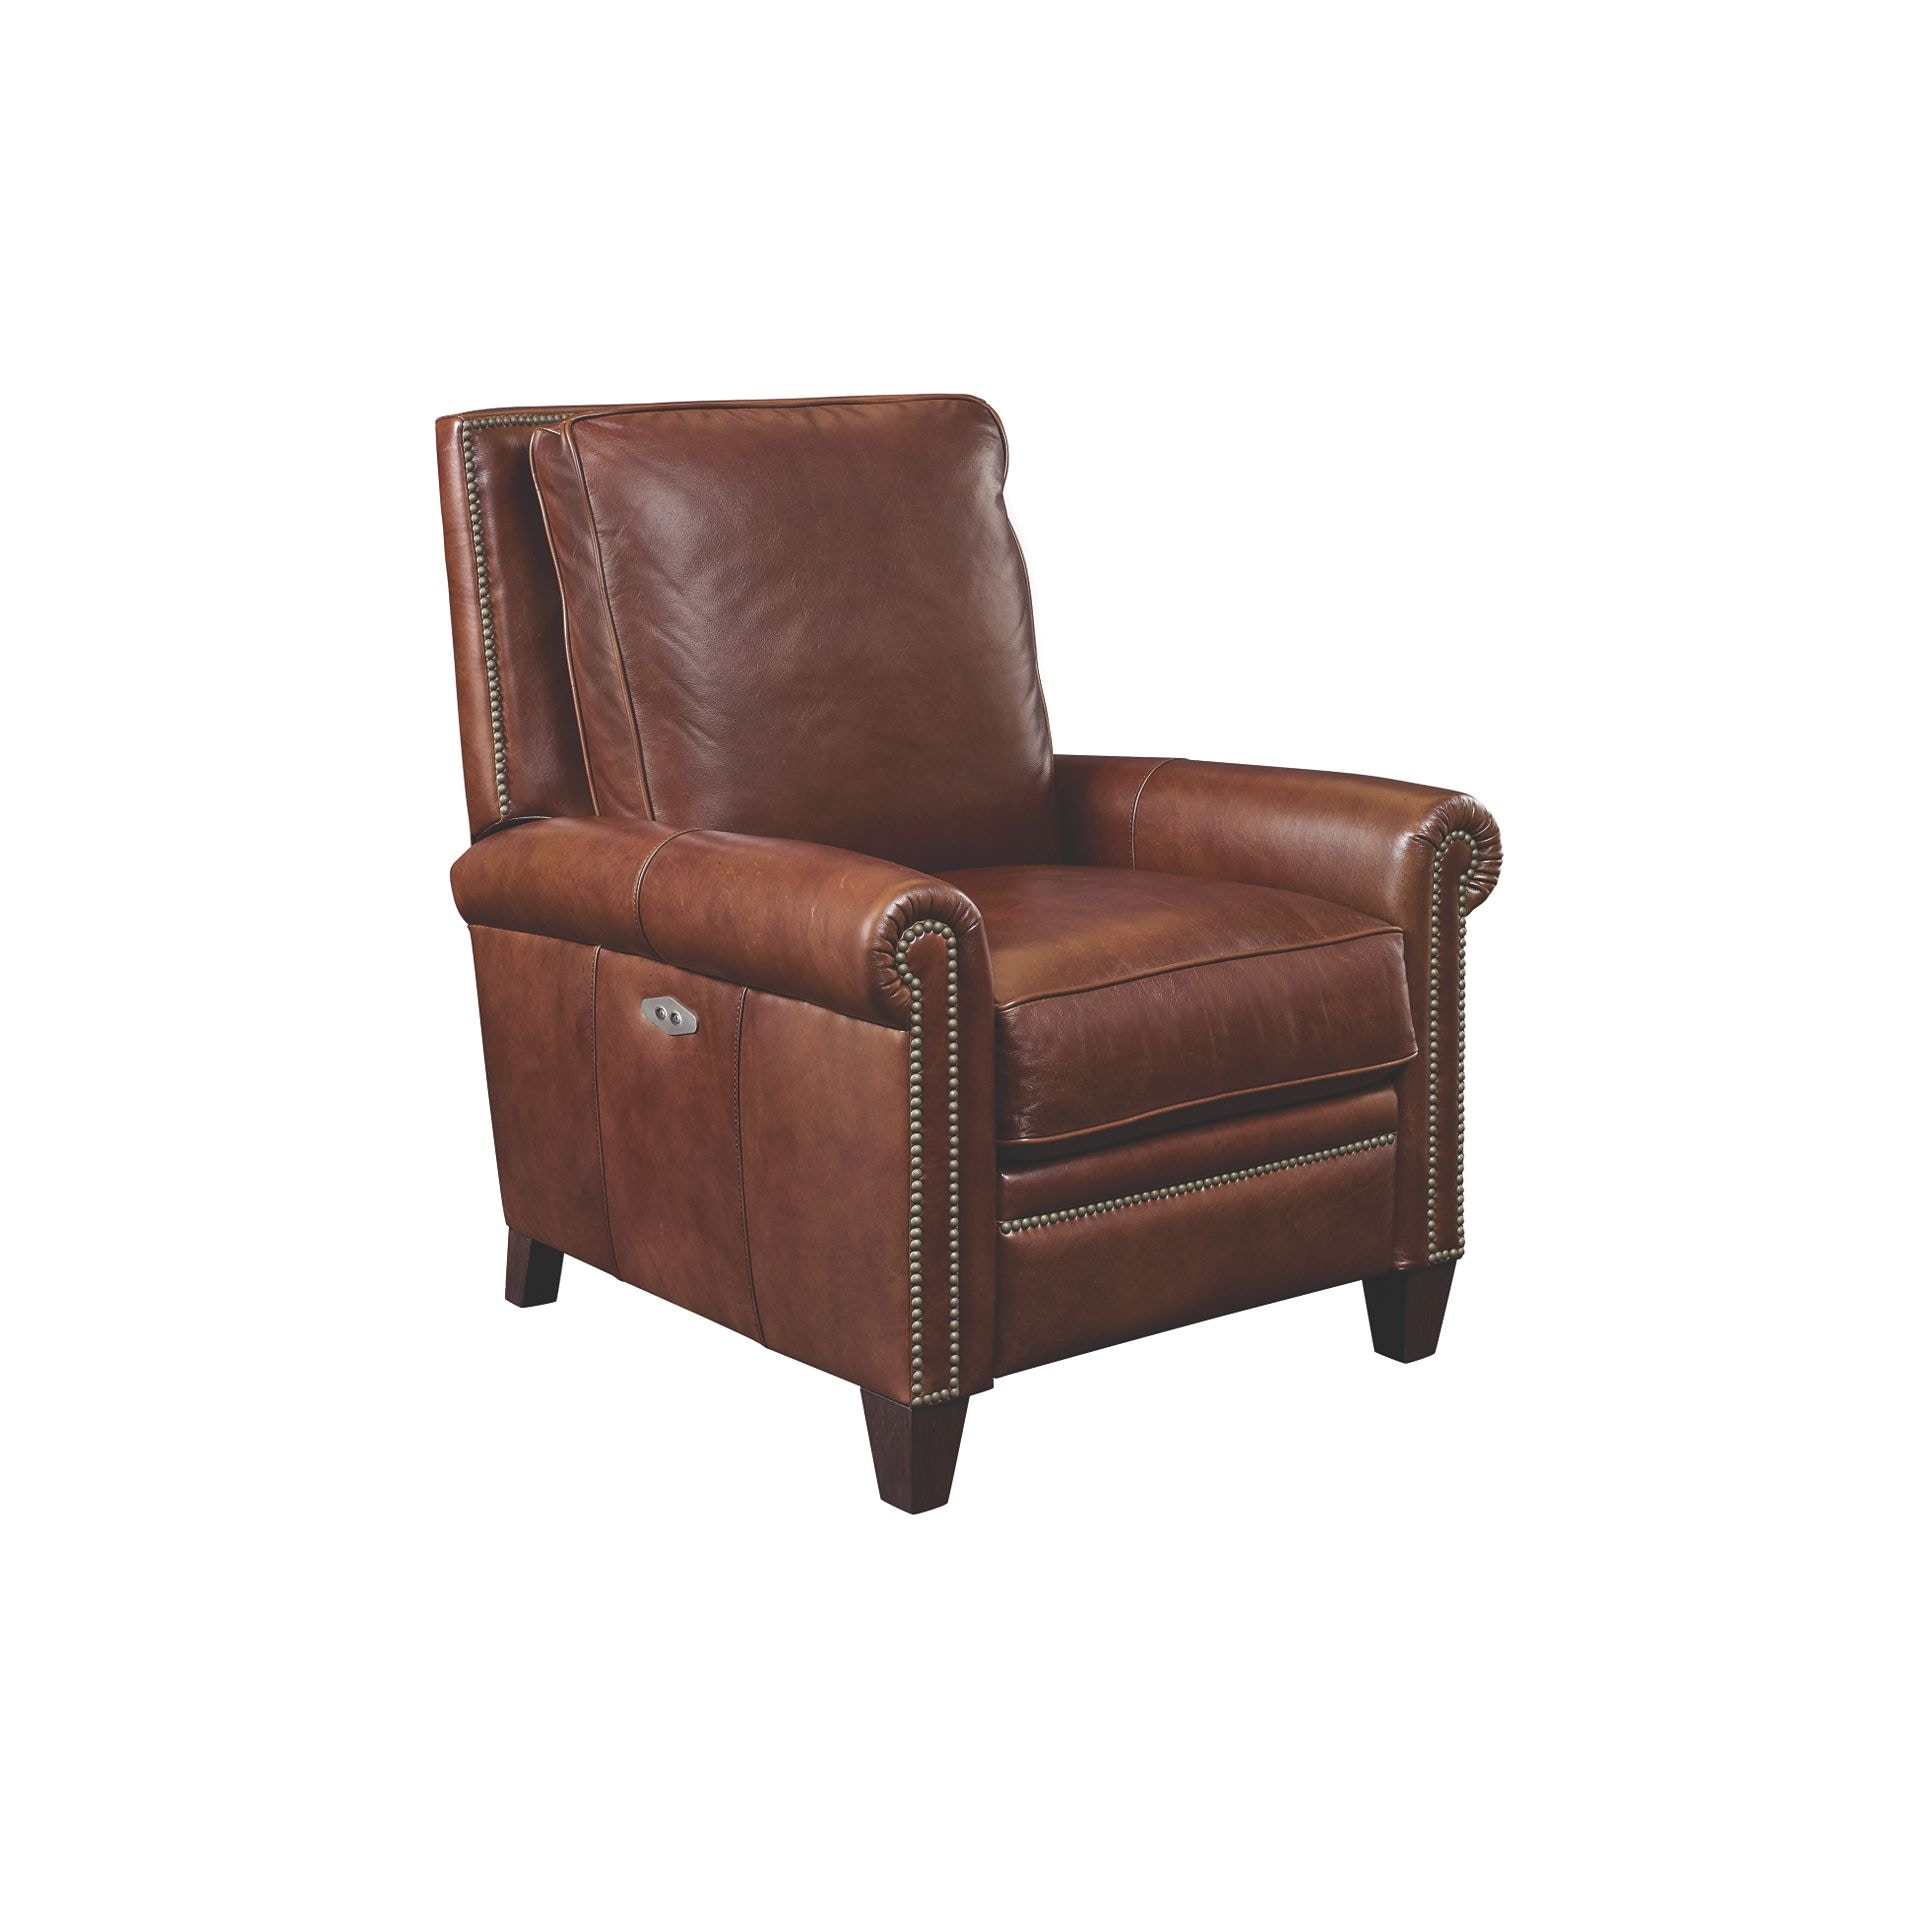 Henredon Furniture Henredon Leather Company Lugano Power Recliner IL8883-RE  sc 1 st  Goodu0027s Home Furnishings & Henredon Furniture IL8883-RE Living Room Henredon Leather Company ... islam-shia.org